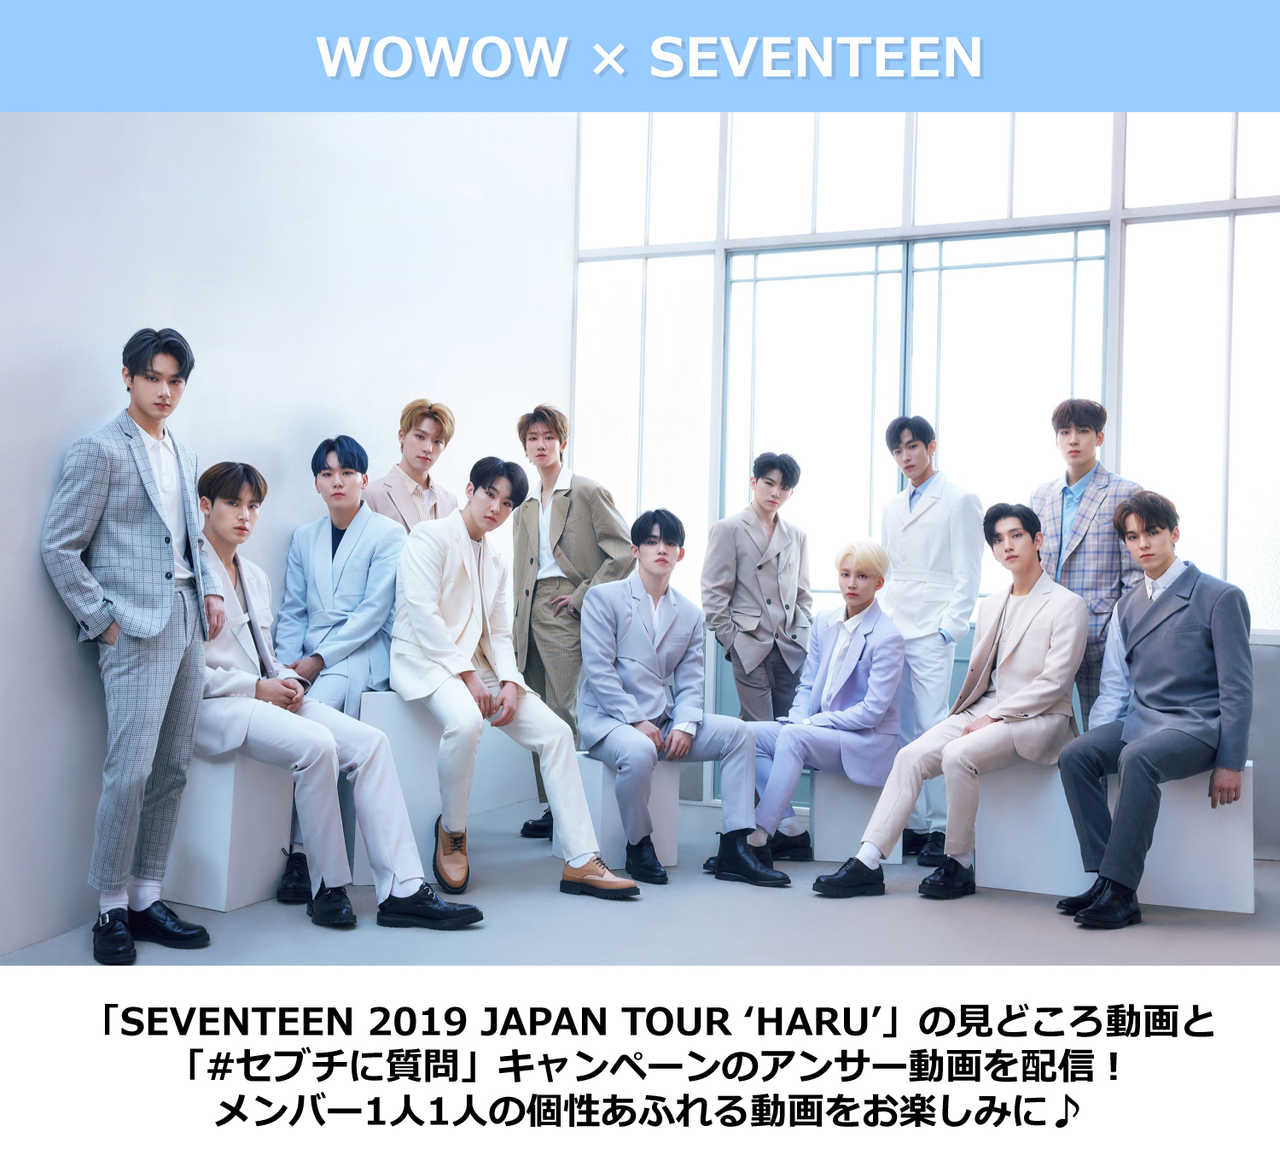 WOWOW × SEVENTEEN